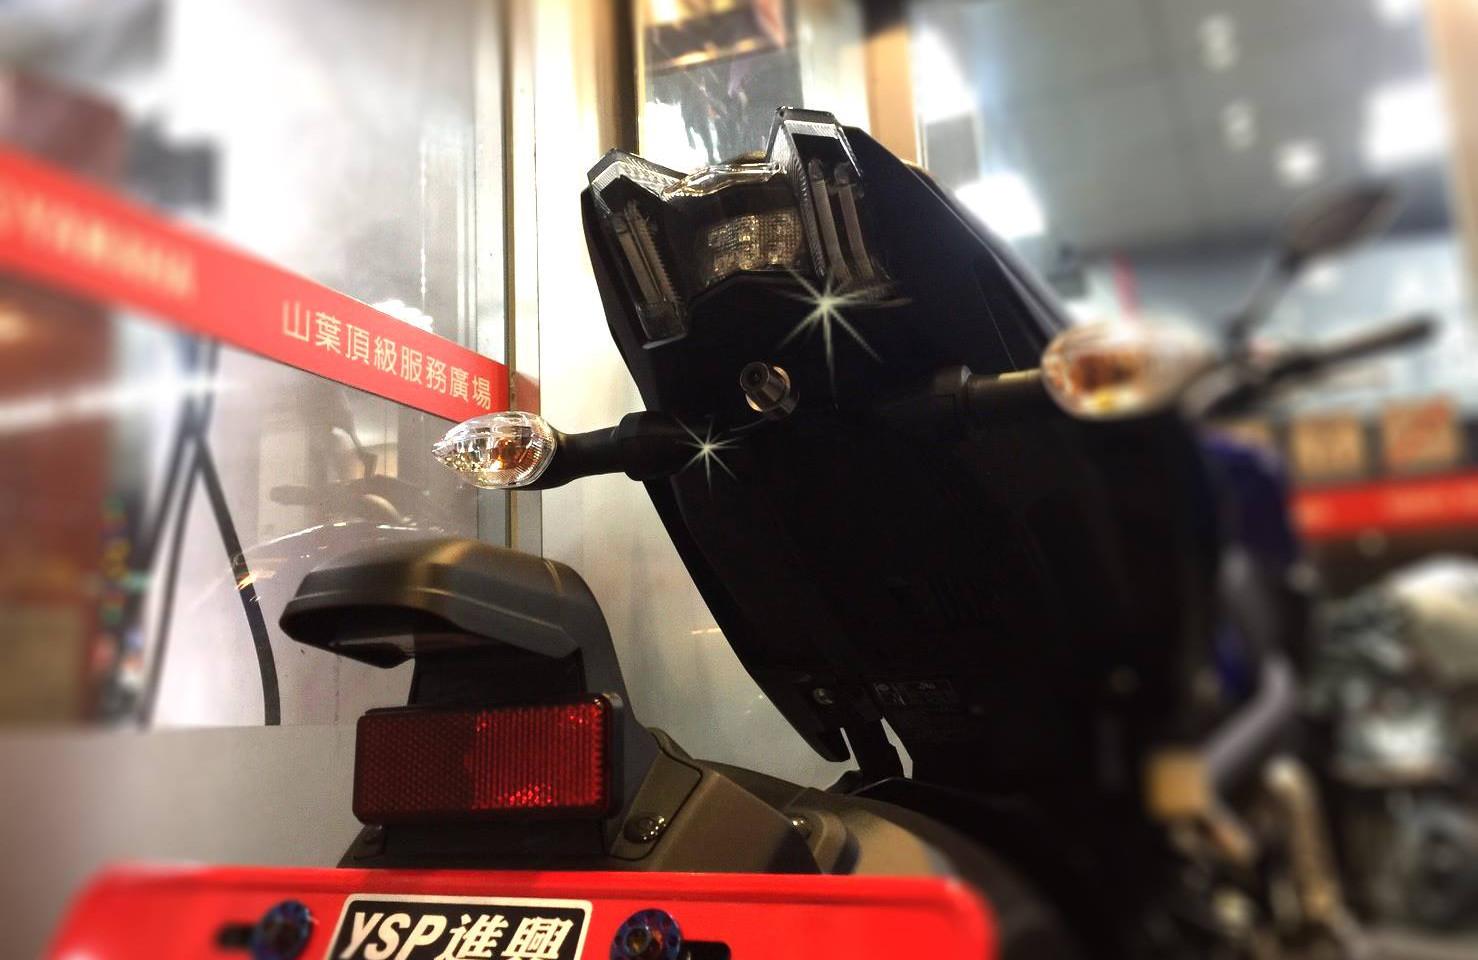 桃園 YAMAHA YSP 進興輪業